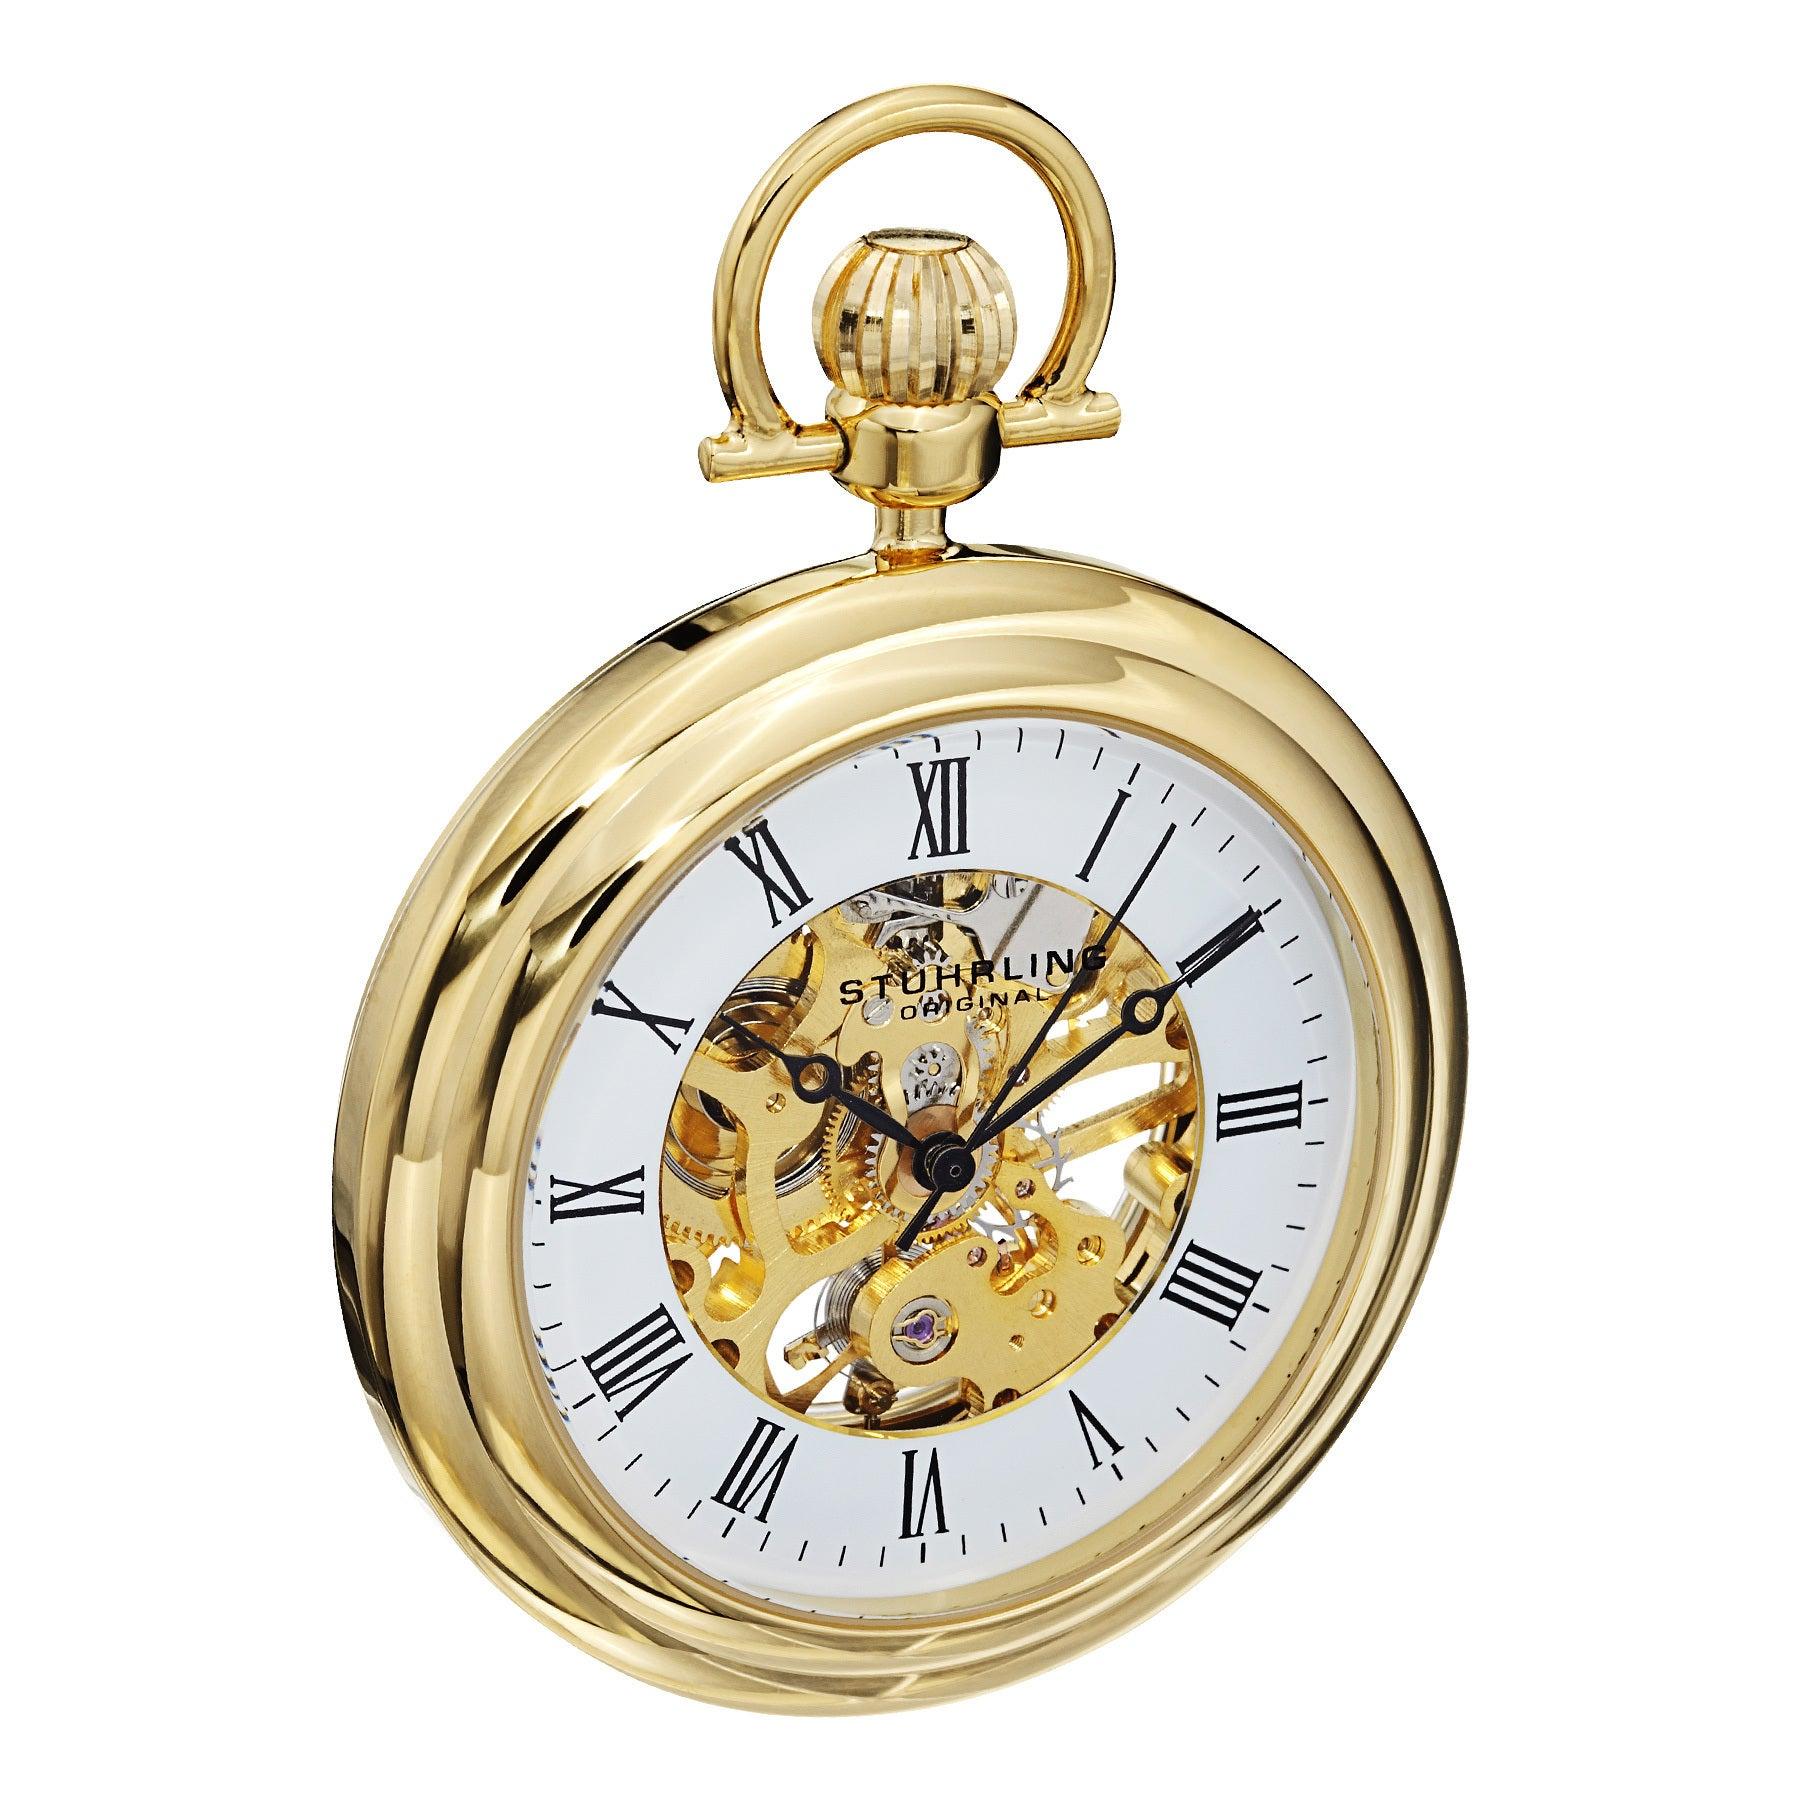 7d6c43477 Shop Stuhrling Original Men's Mechanical Vintage Pocket Watch - Free  Shipping Today - Overstock - 9930424